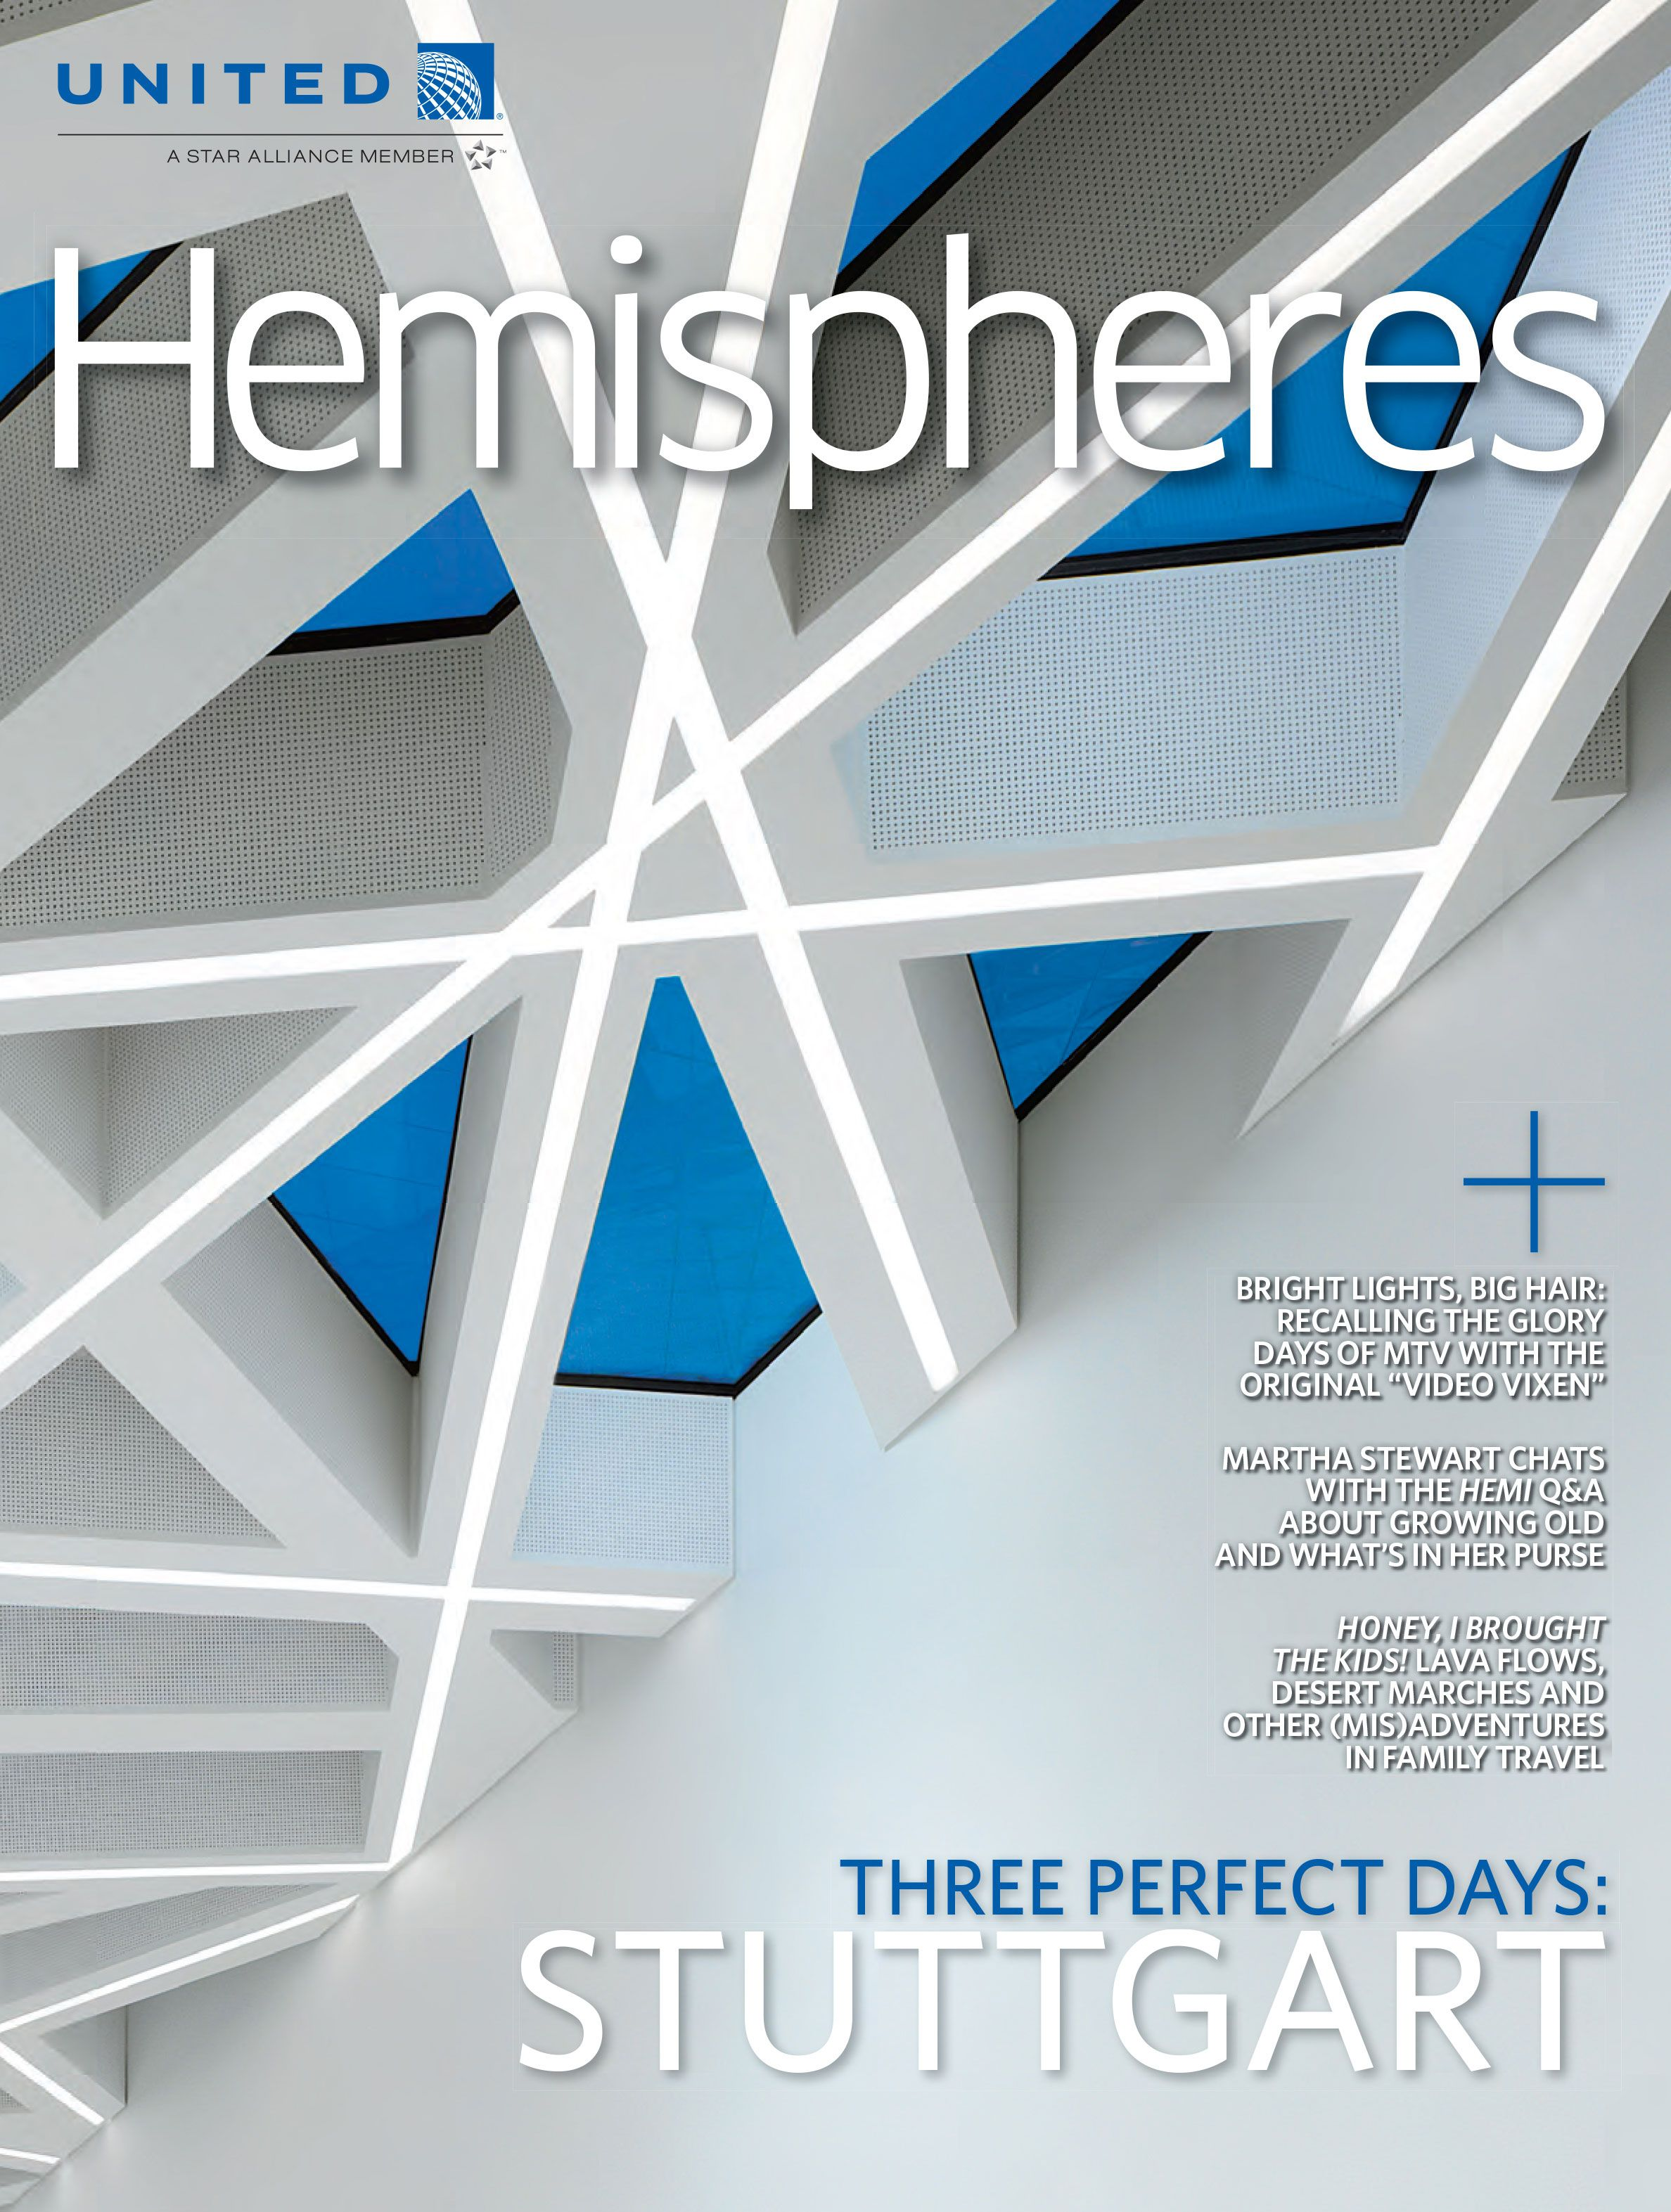 United Airlines : Hemispheres